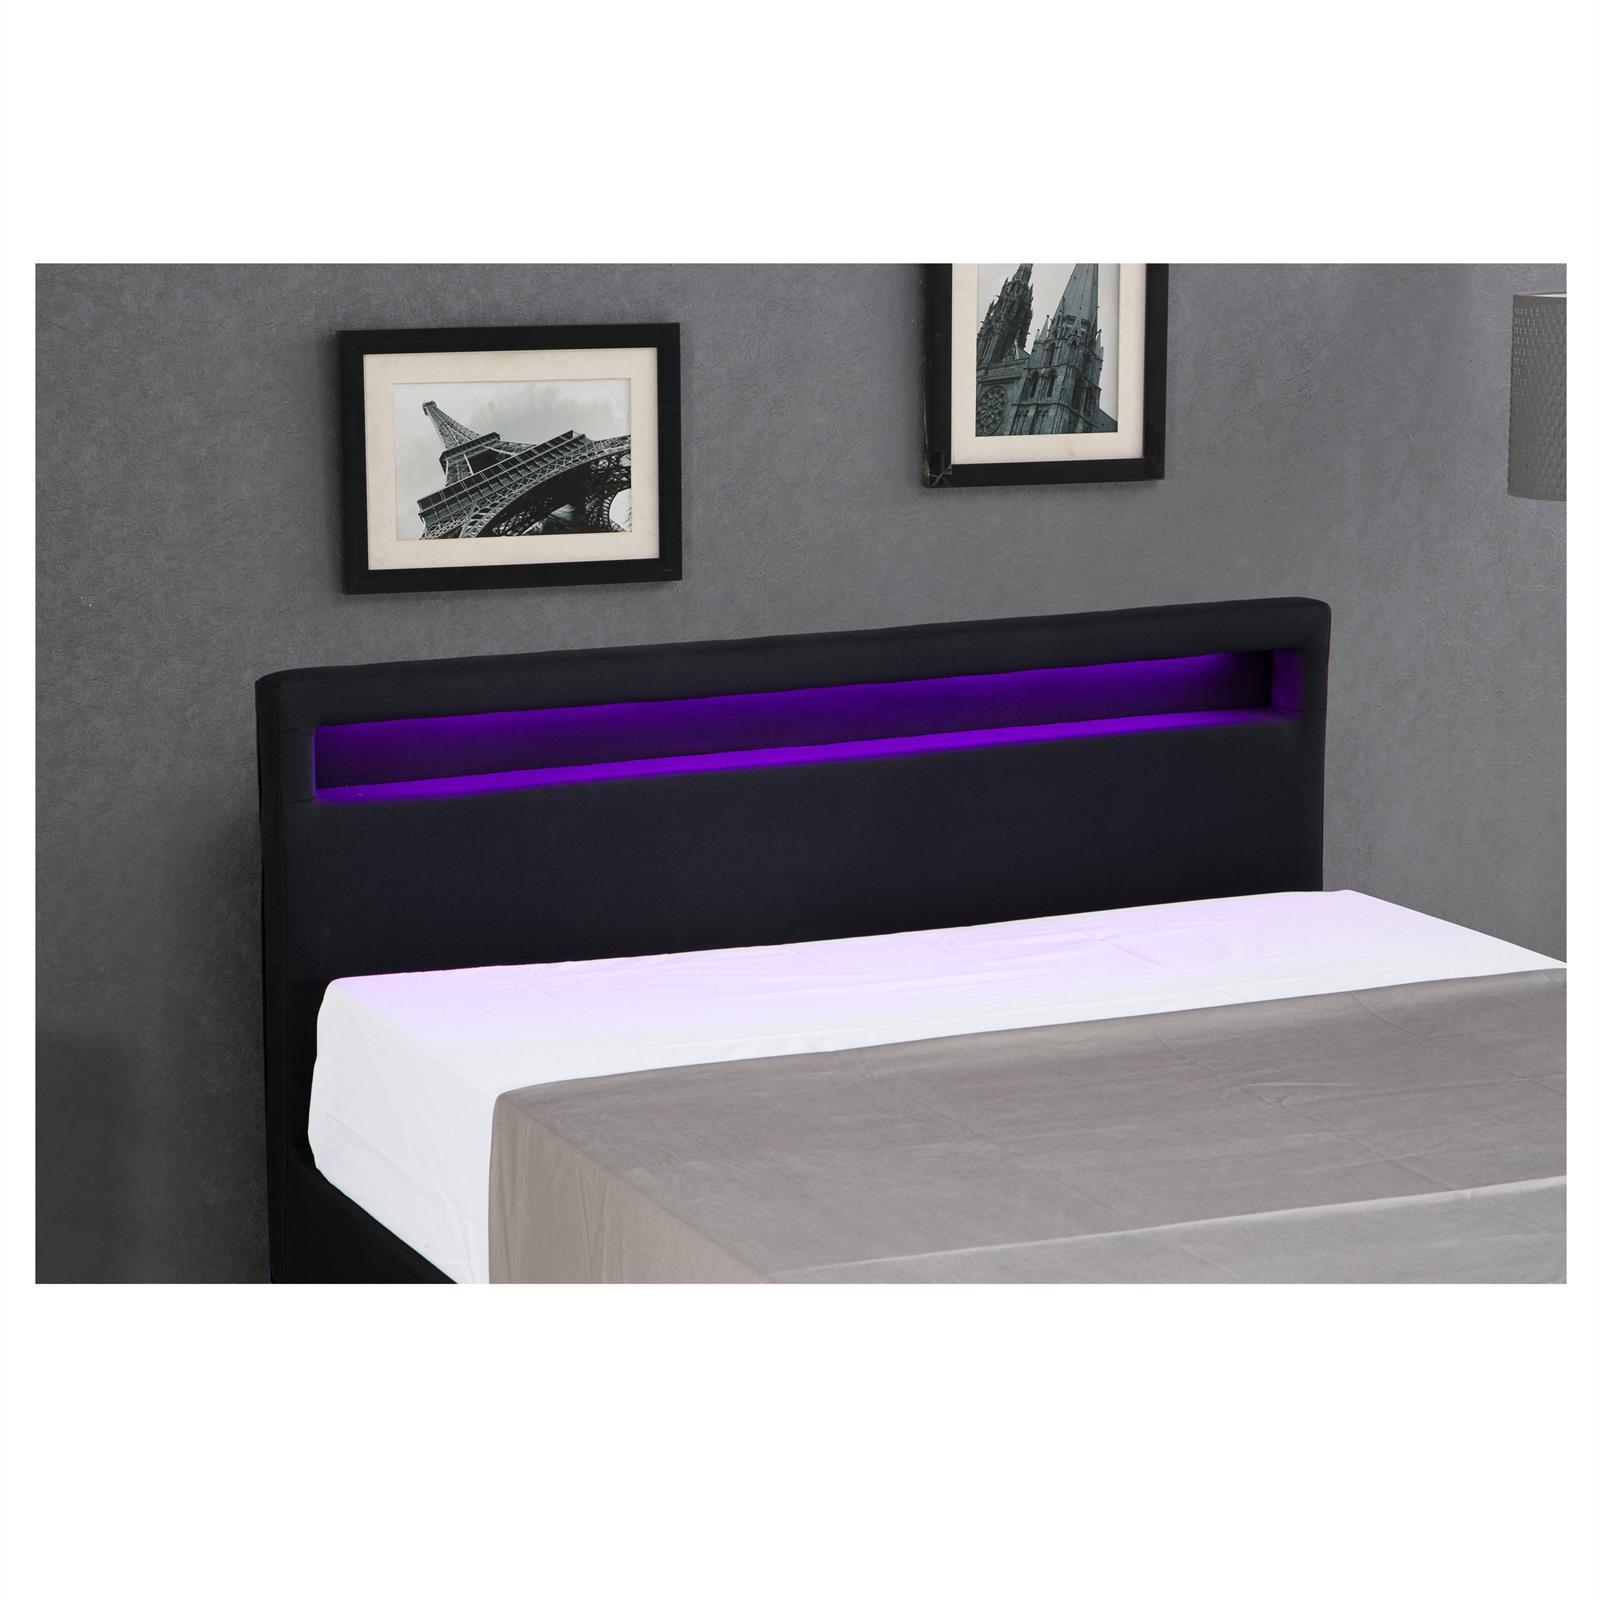 polsterbett einzelbett jugendbett doppelbett mit led 120 x 200 cm stoffbezug ebay. Black Bedroom Furniture Sets. Home Design Ideas